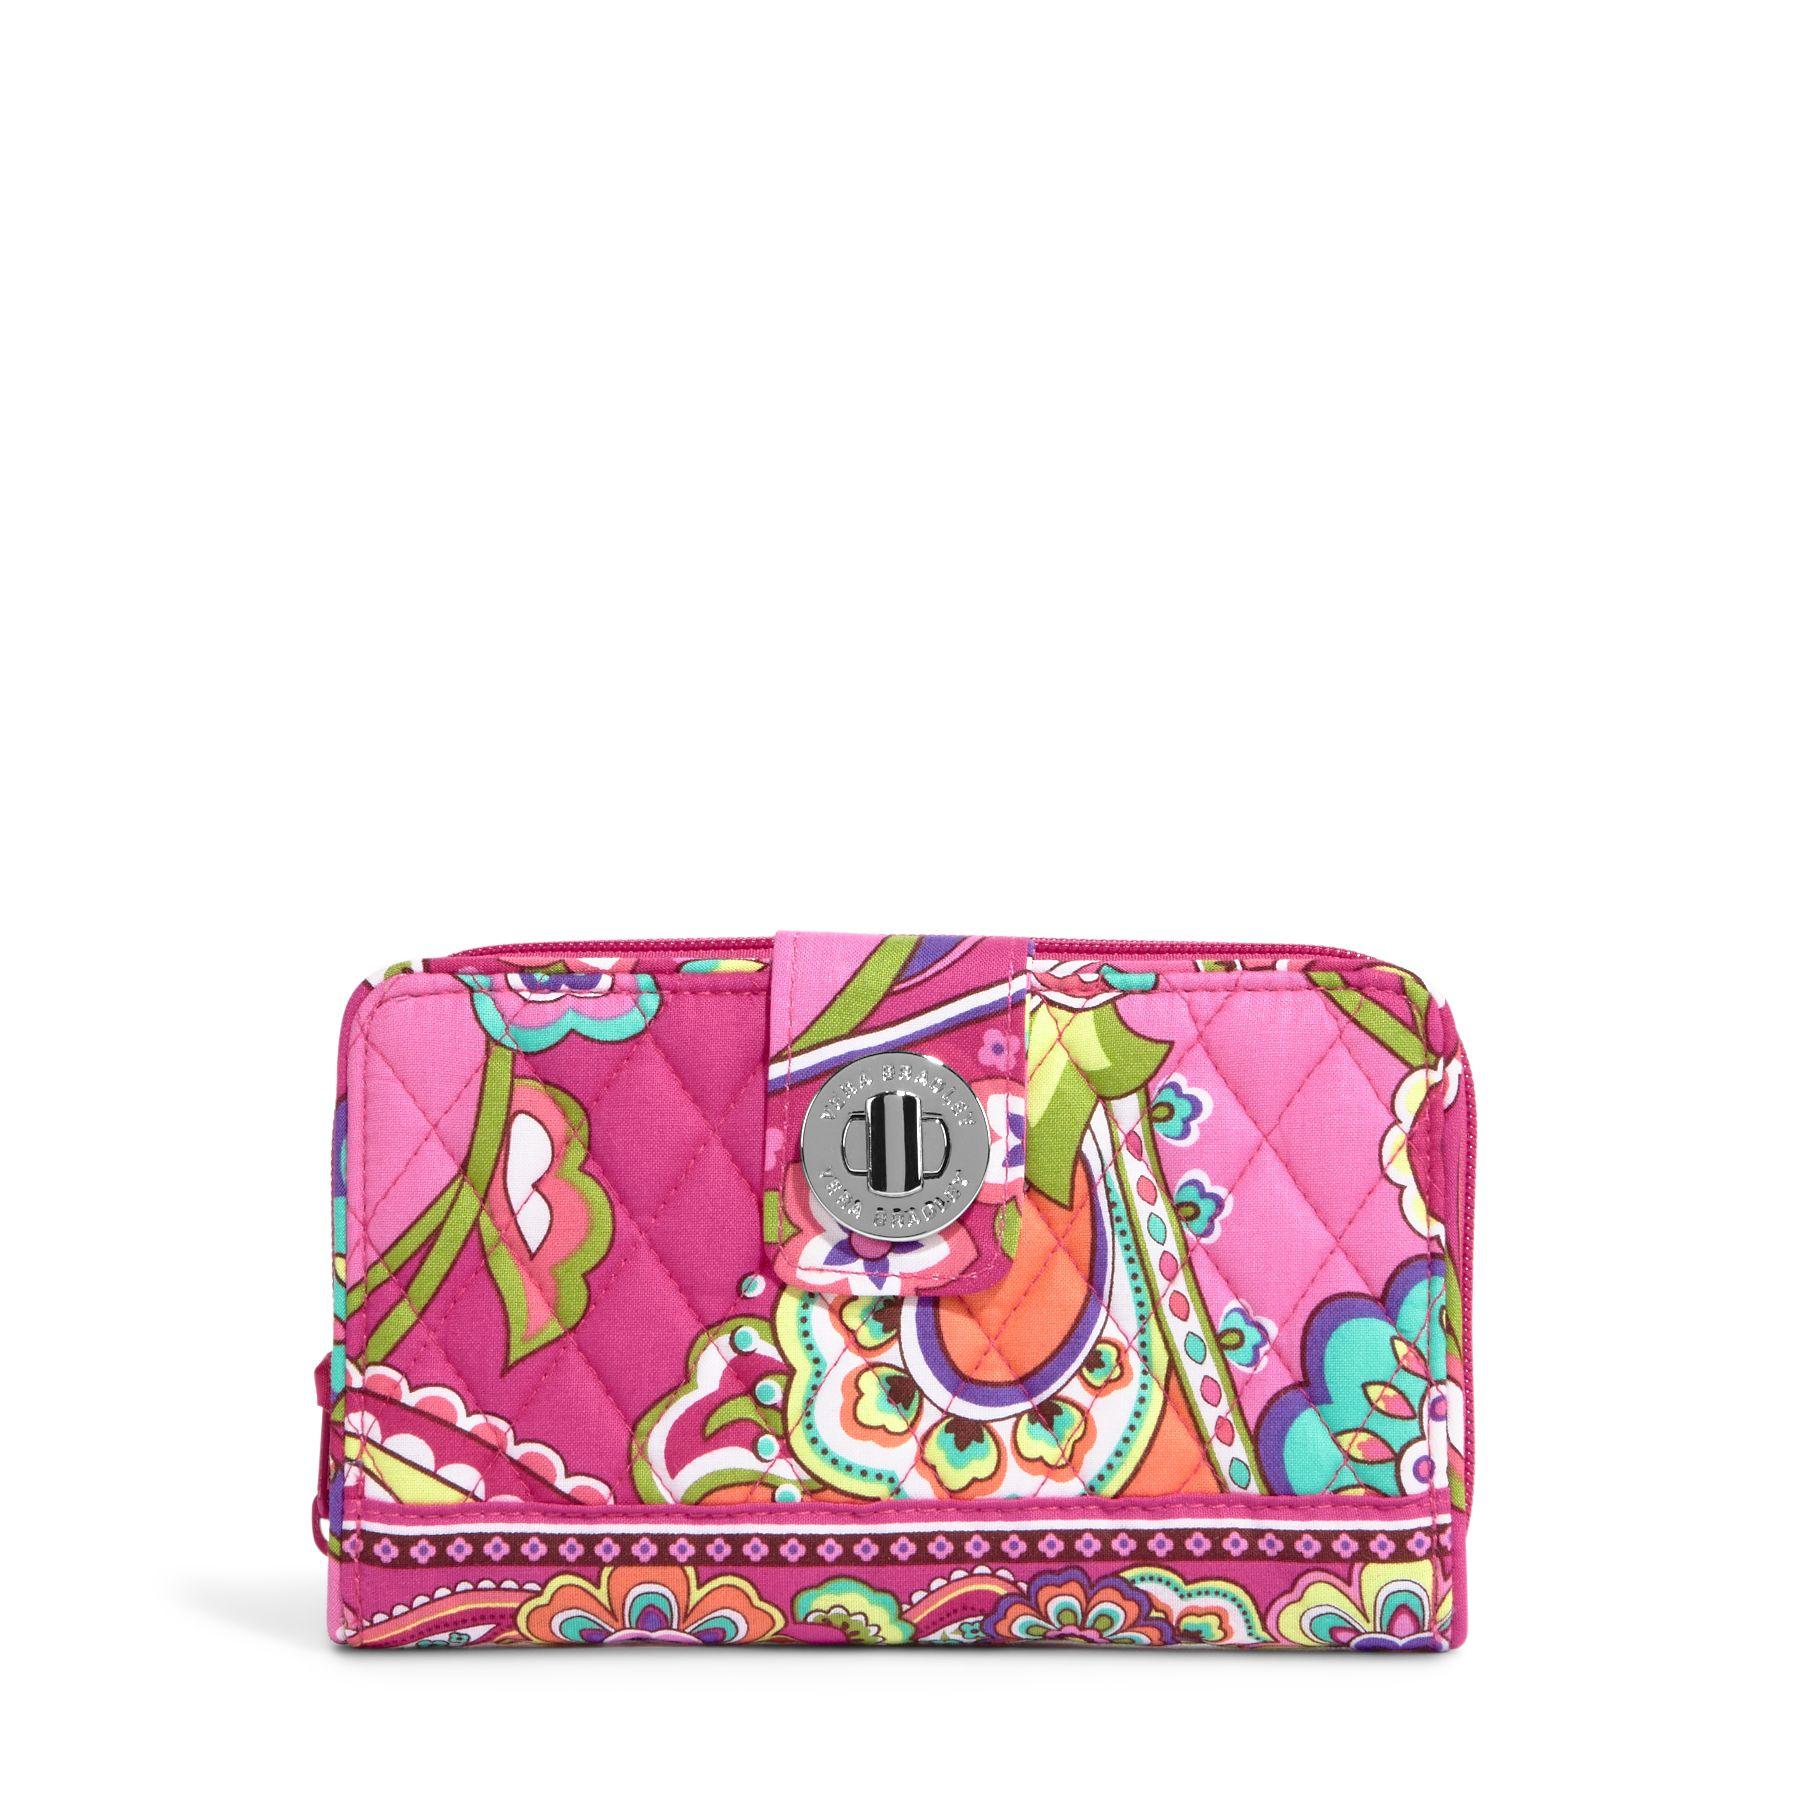 Vera Bradley Turn Lock Wallet in Pink Swirls